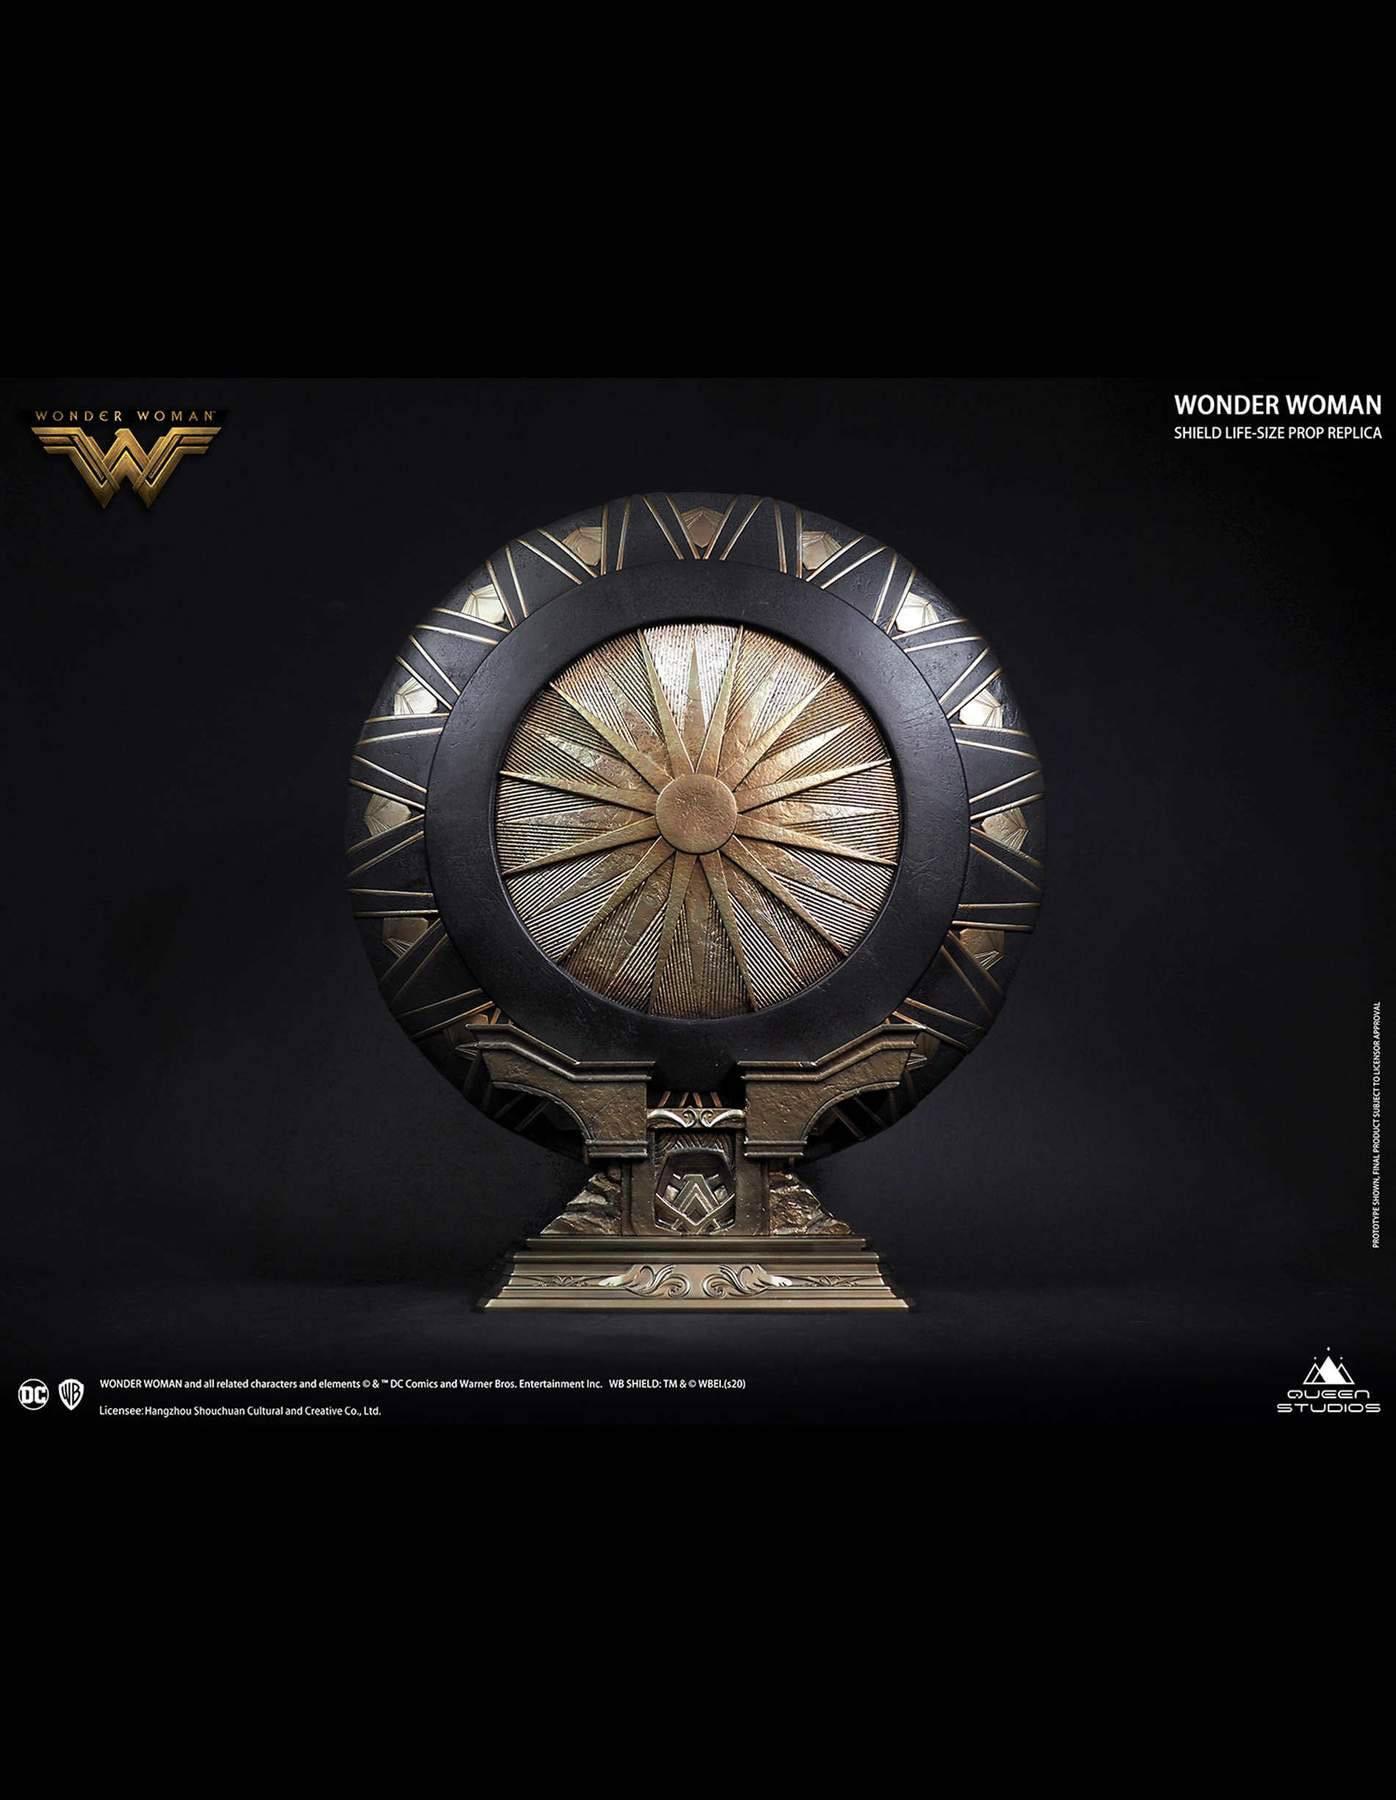 Wonder Woman Life-Size Replica Wonder Woman Shield Regular Edition 58 cm